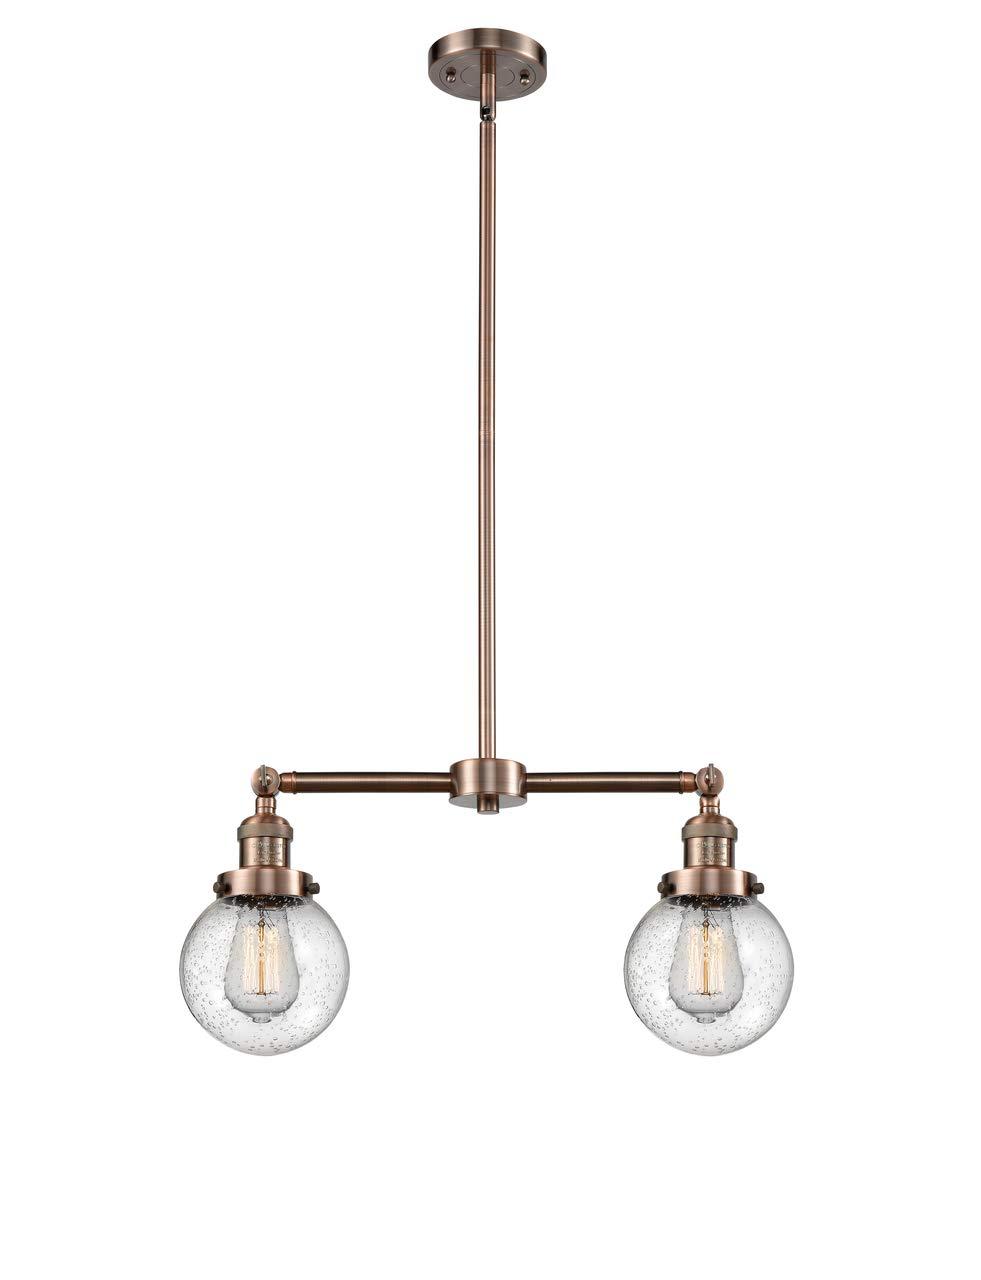 Innovations 209-AC-G204-6 2 Light Chandelier, Antique Copper